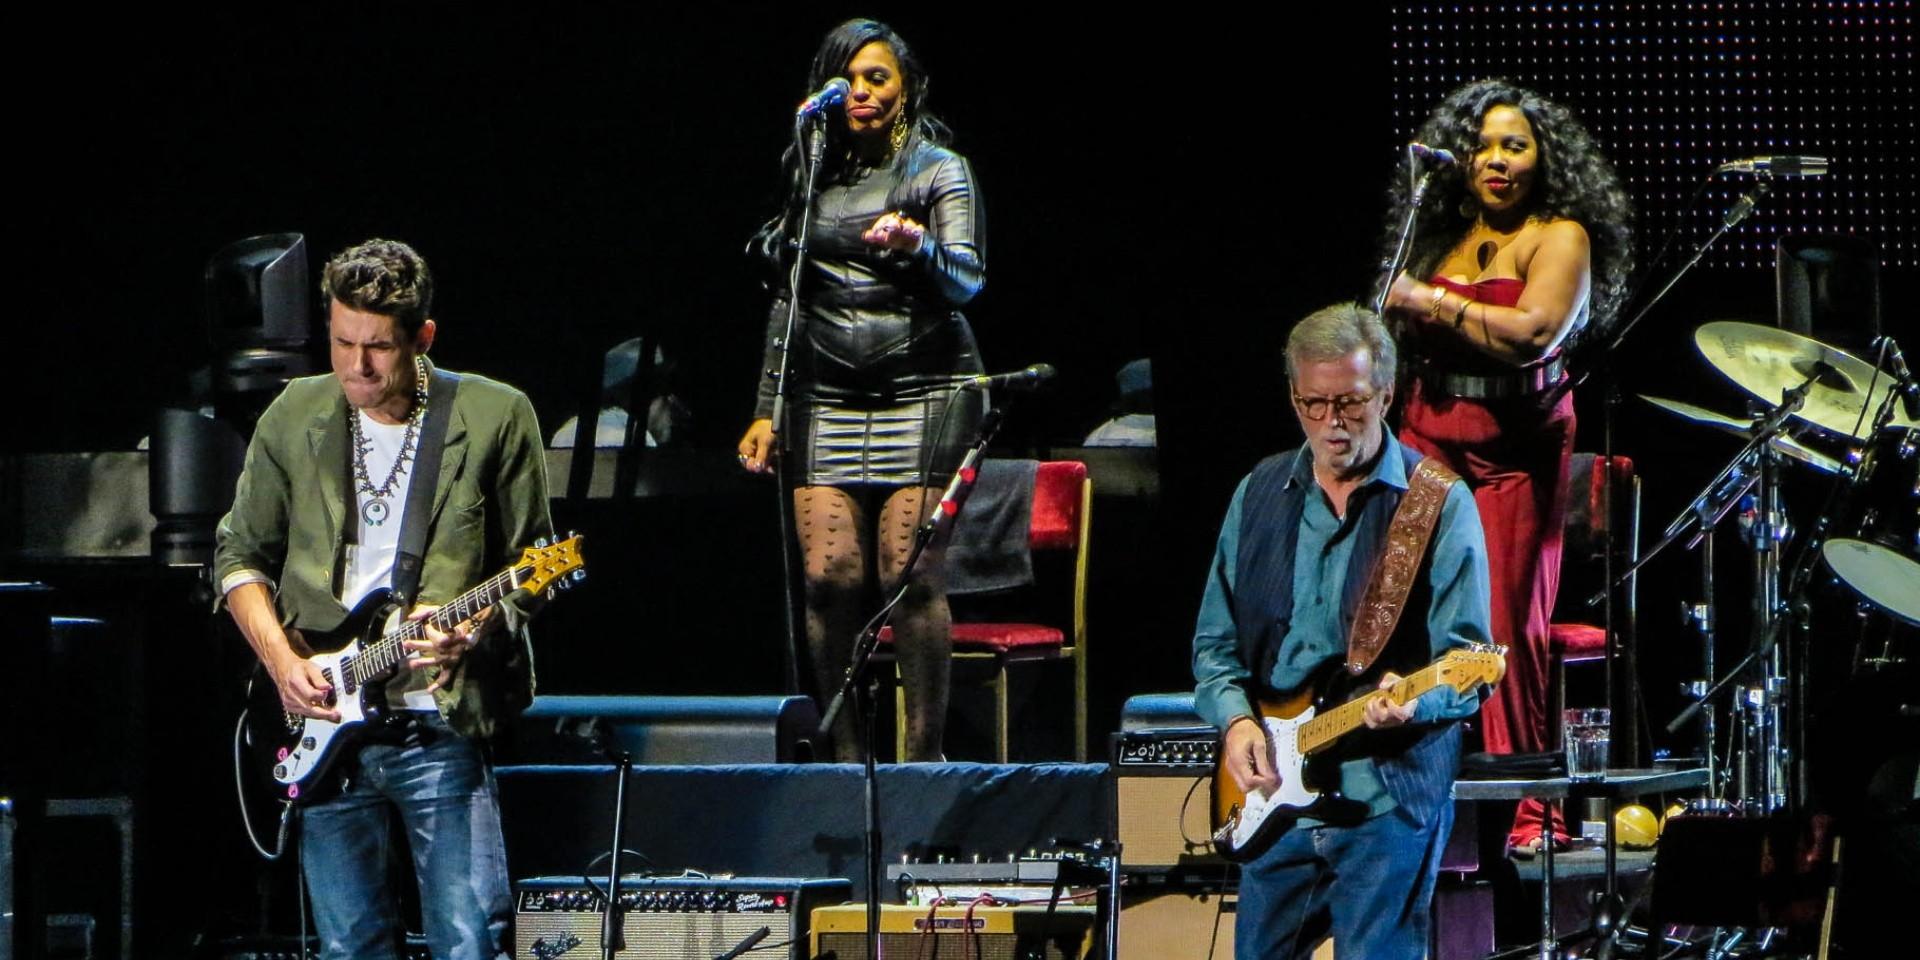 John Mayer to make appearance at Eric Clapton's Crossroads Guitar Festival's set